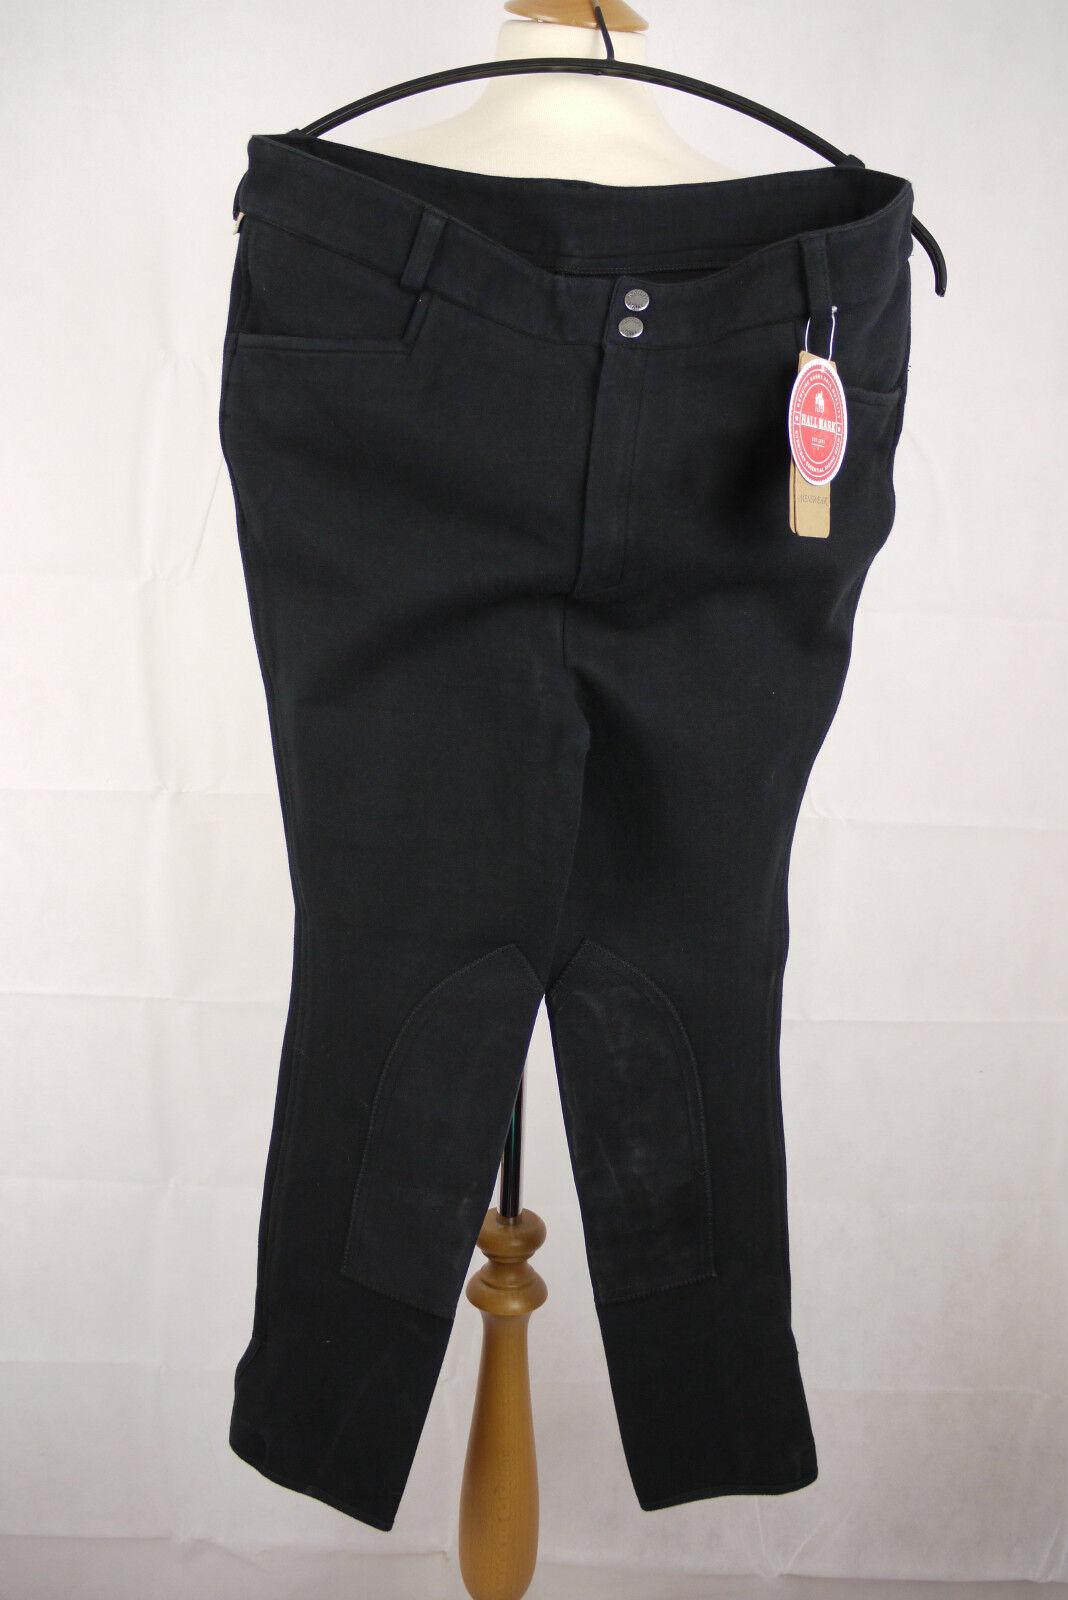 Harry HALL BURFORD para hombres Calzones tamaño 38 Reg. Color Negro